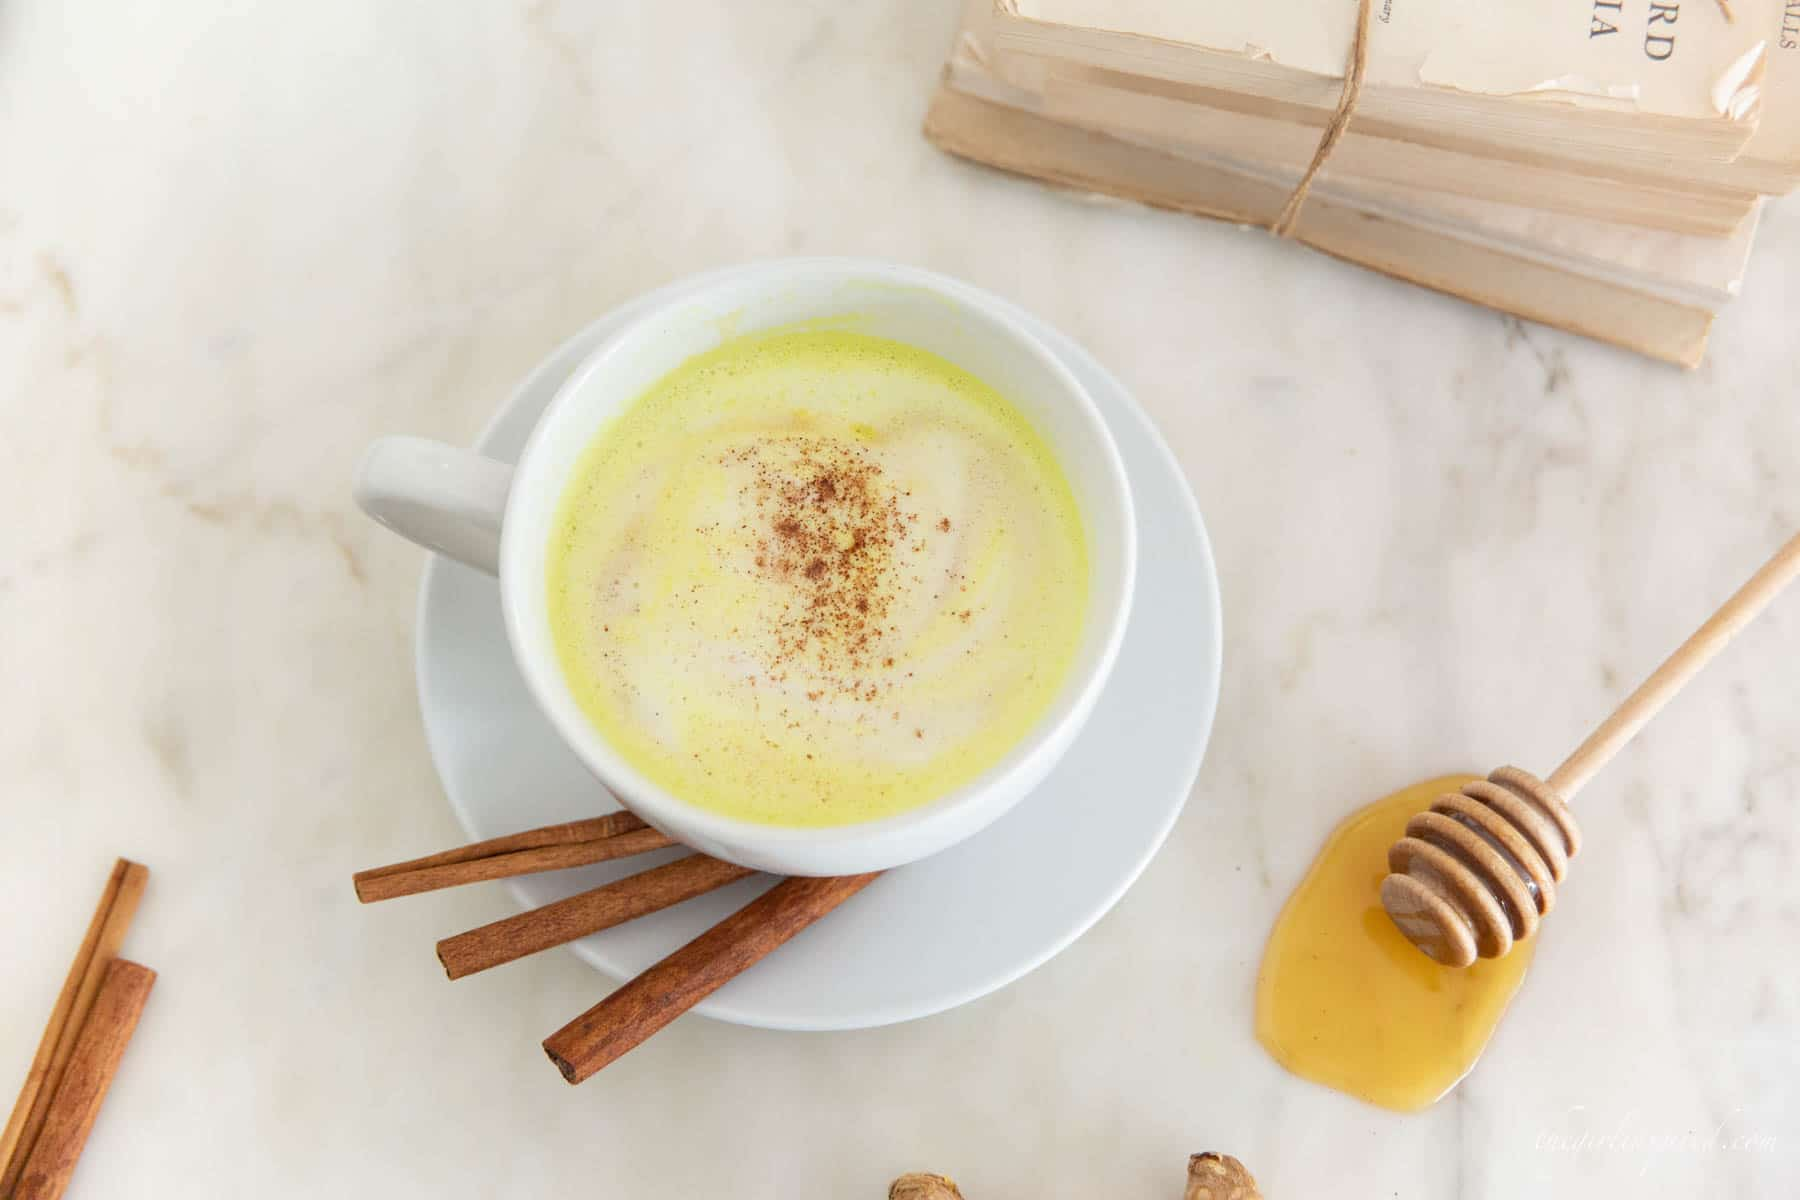 frothy yellow milk in white mug with cinnamon sticks, whole turmeric root, cinnamon sticks, and honey